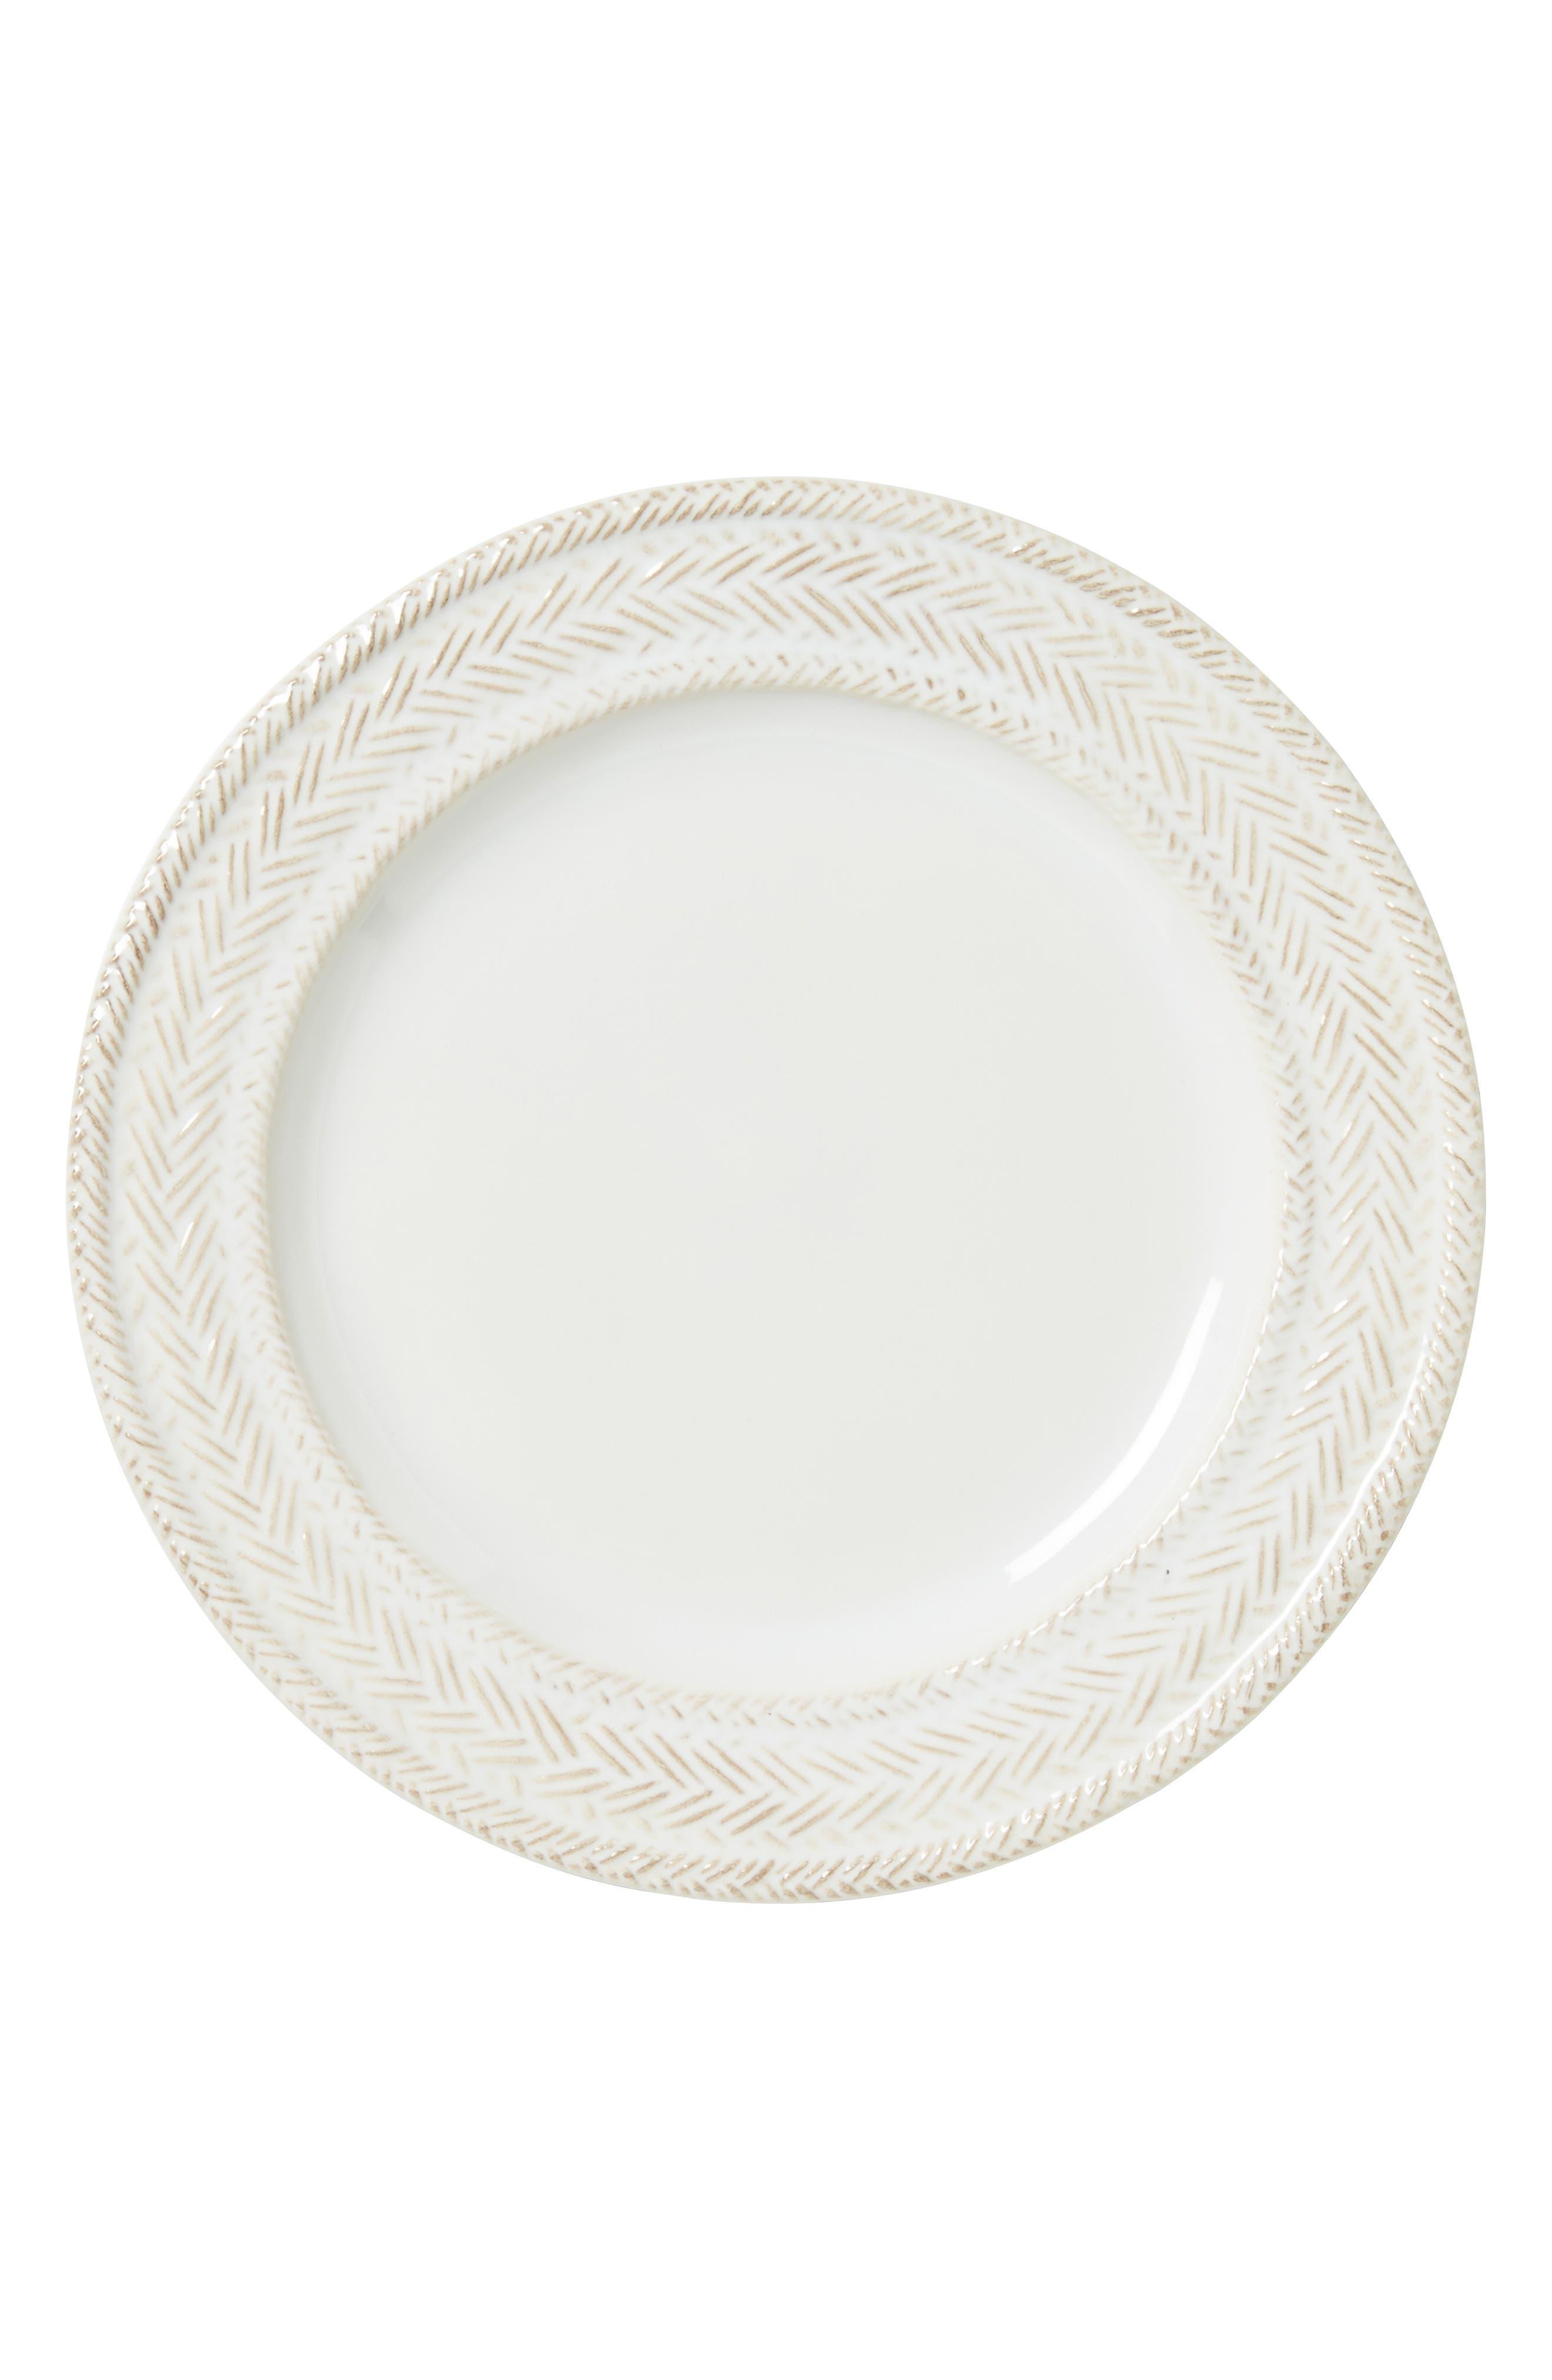 Main Image - Juliska Le Panier Ceramic Salad Plate